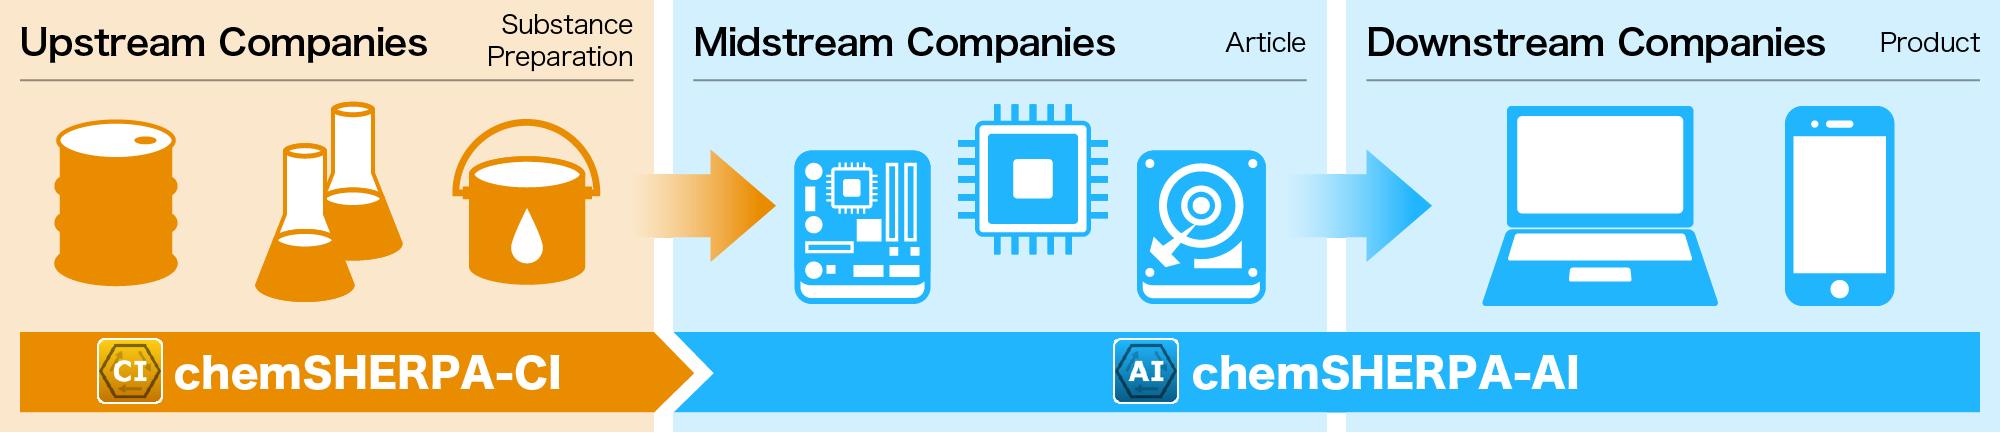 Up→Mid→Downstream Companies